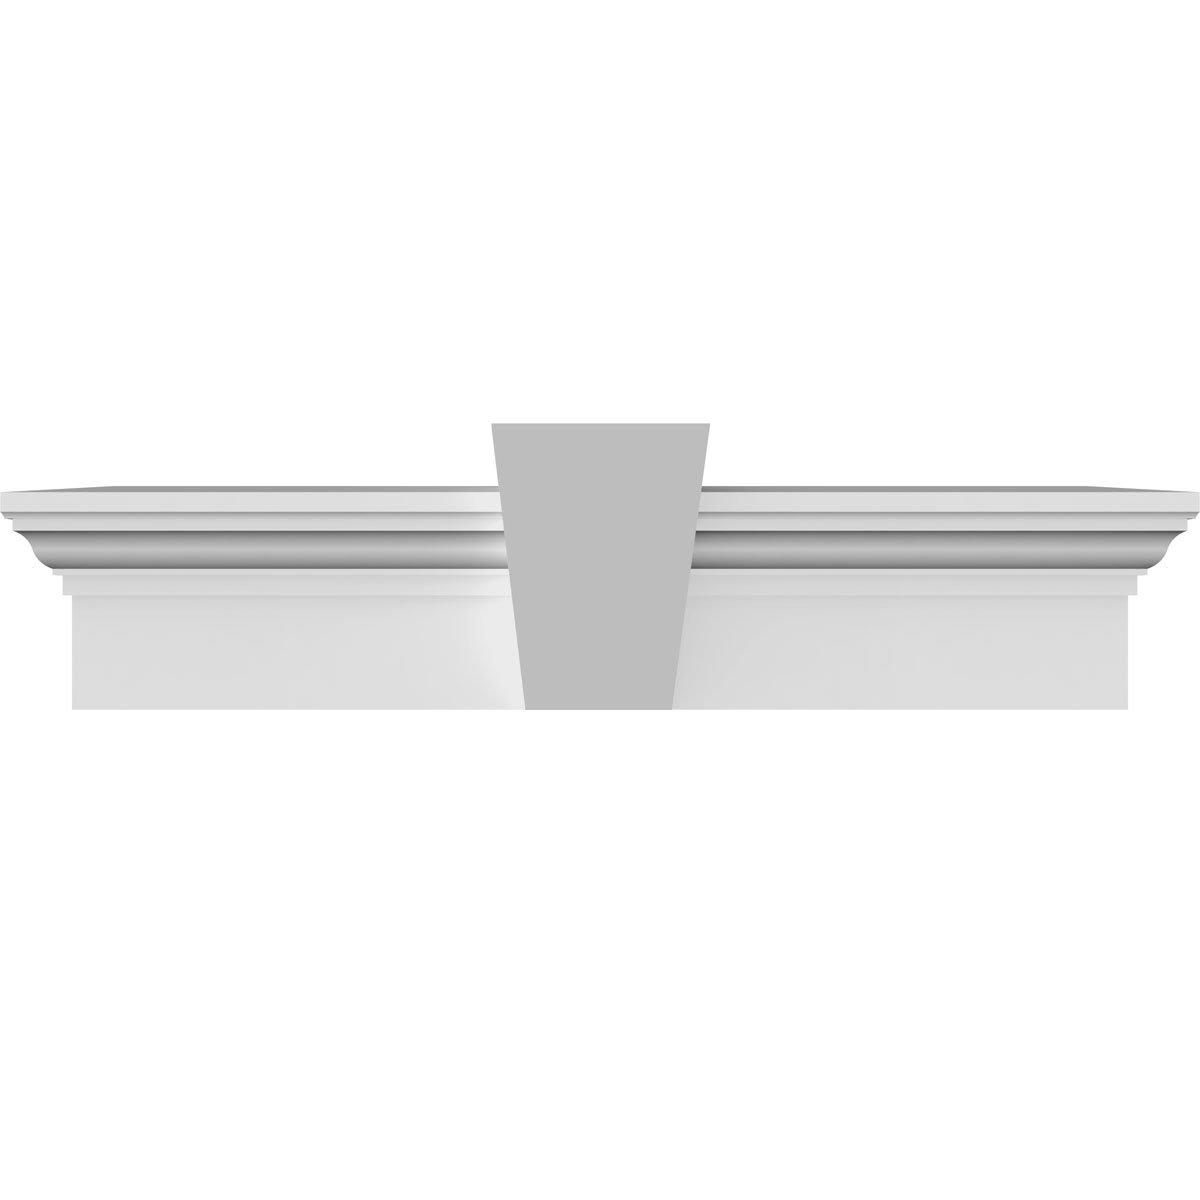 Ekena Millwork CRH06X71KF 71'' Bottom Width x 74 1/2'' Top Width x 6''H x 1''P Crosshead w/Flat Keystone